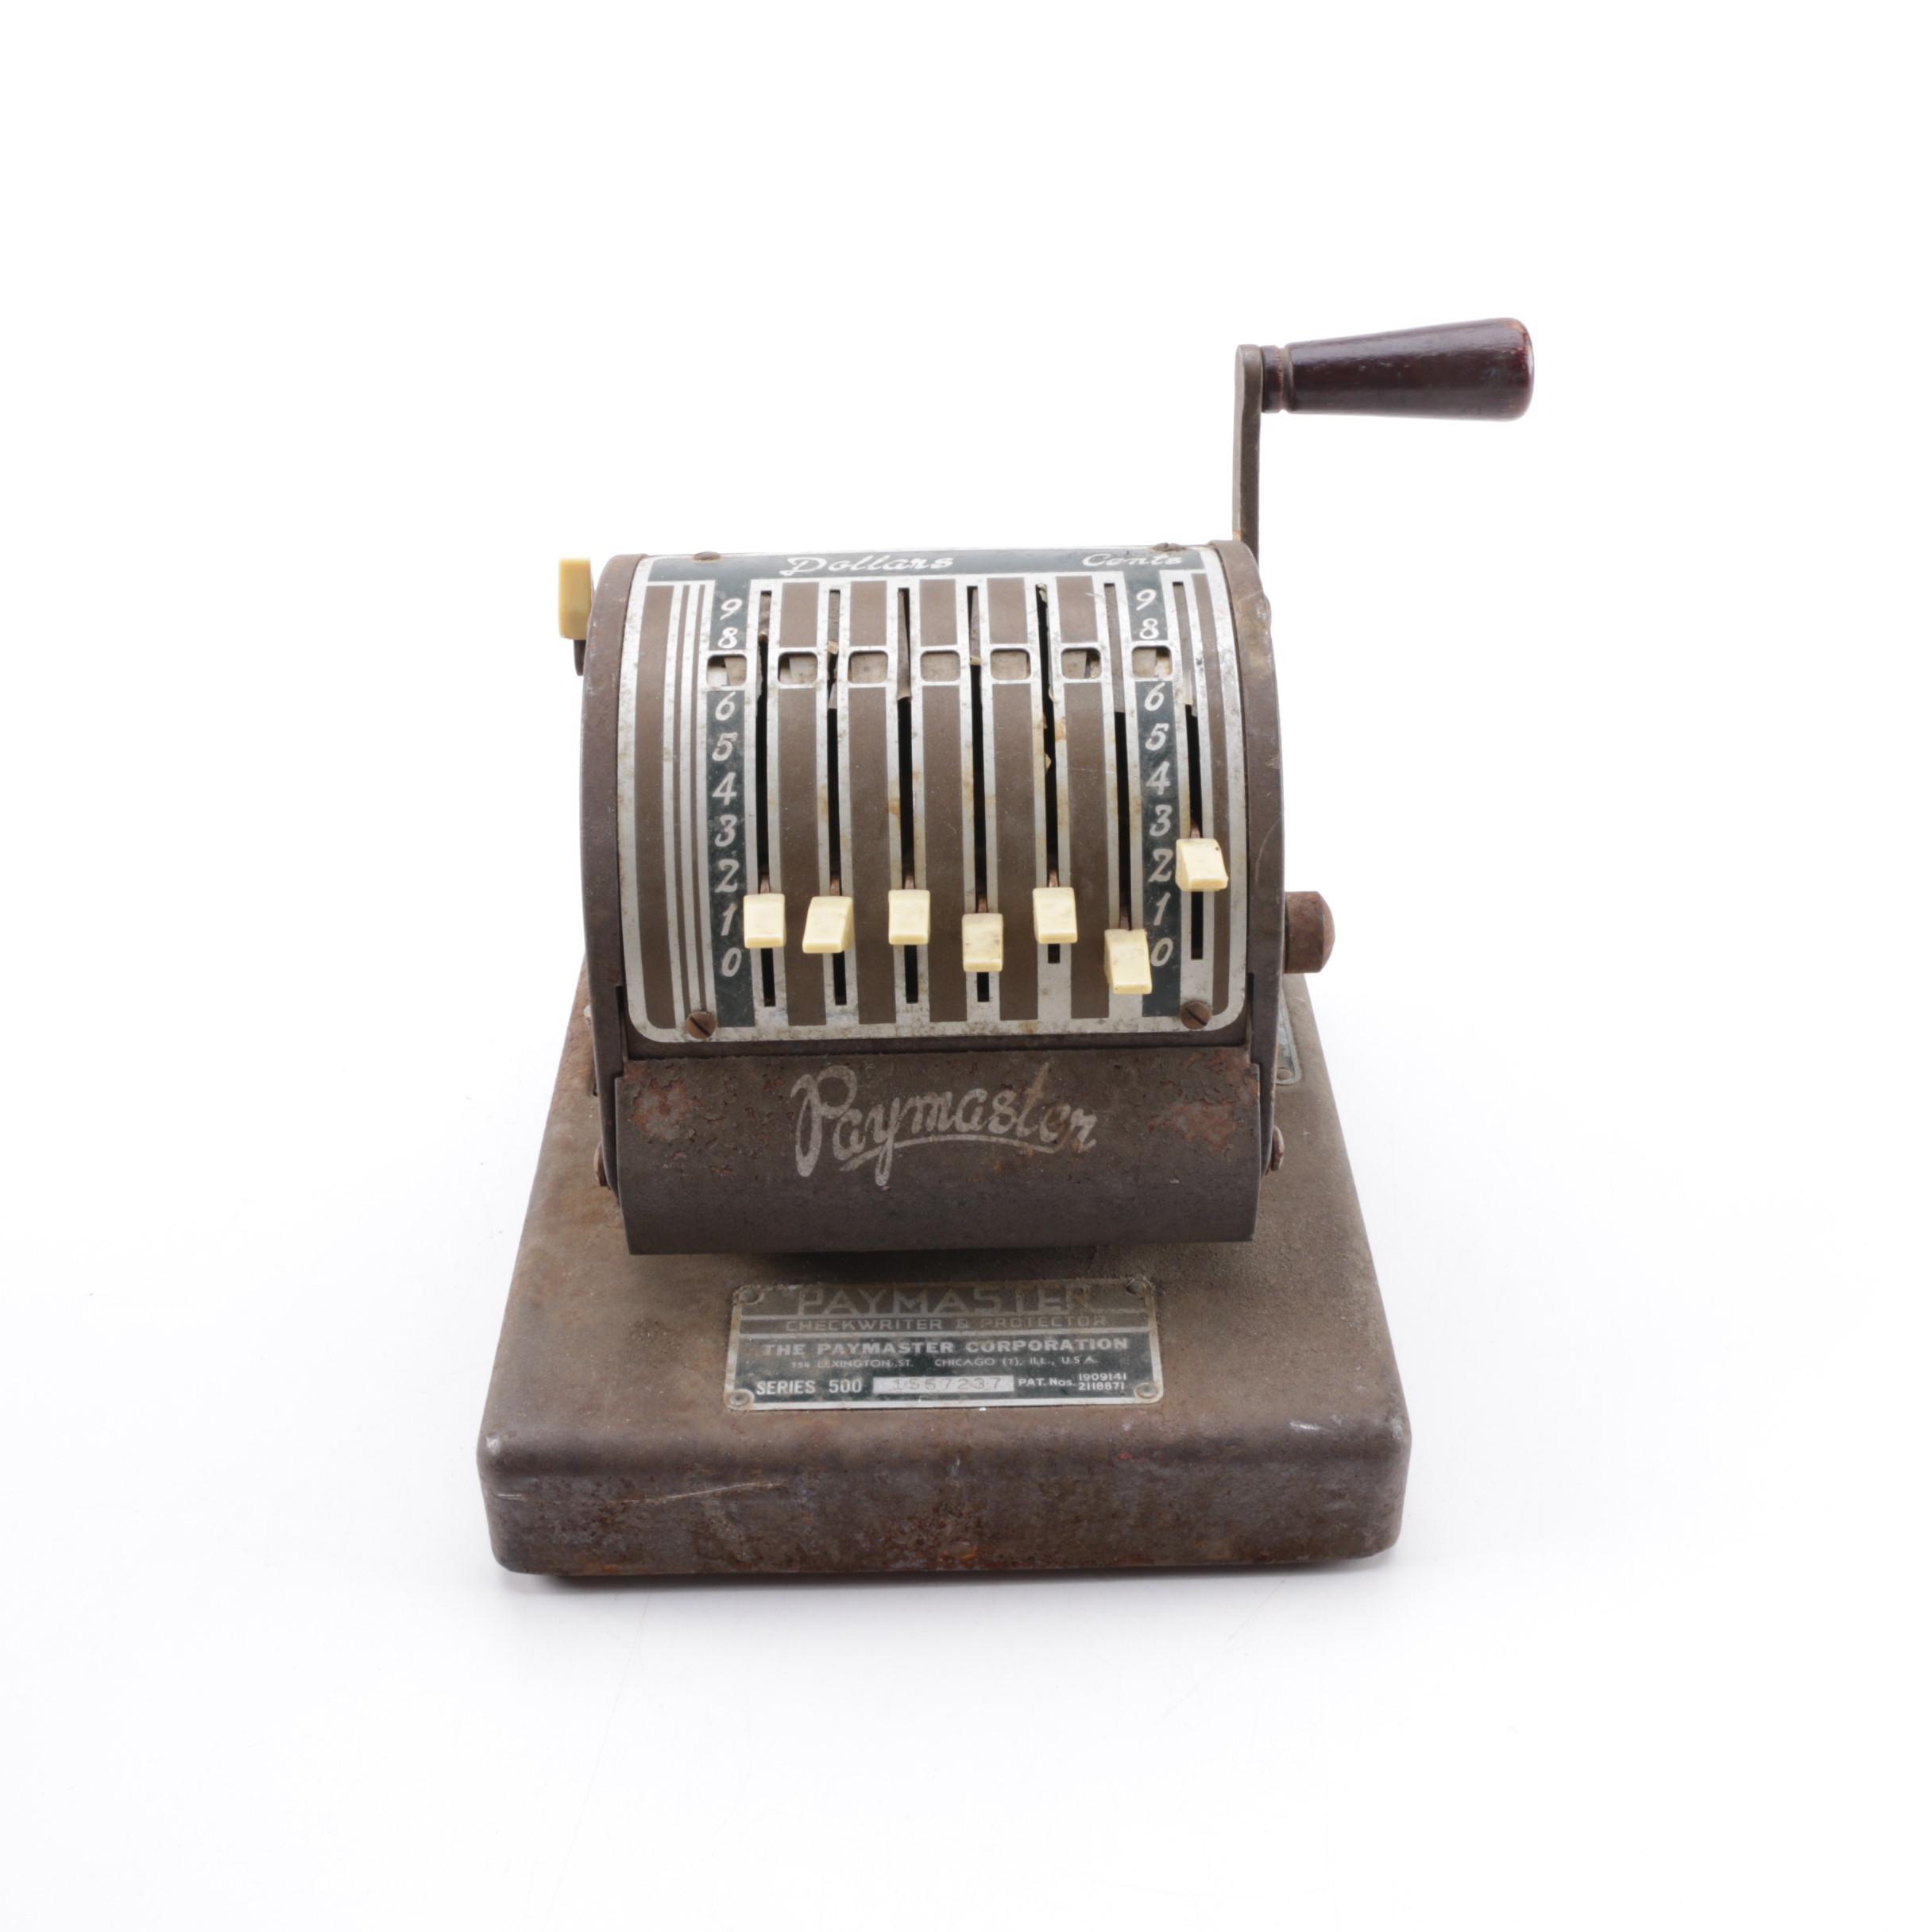 Vintage Paymaster Series 500 Checkwriter & Protector